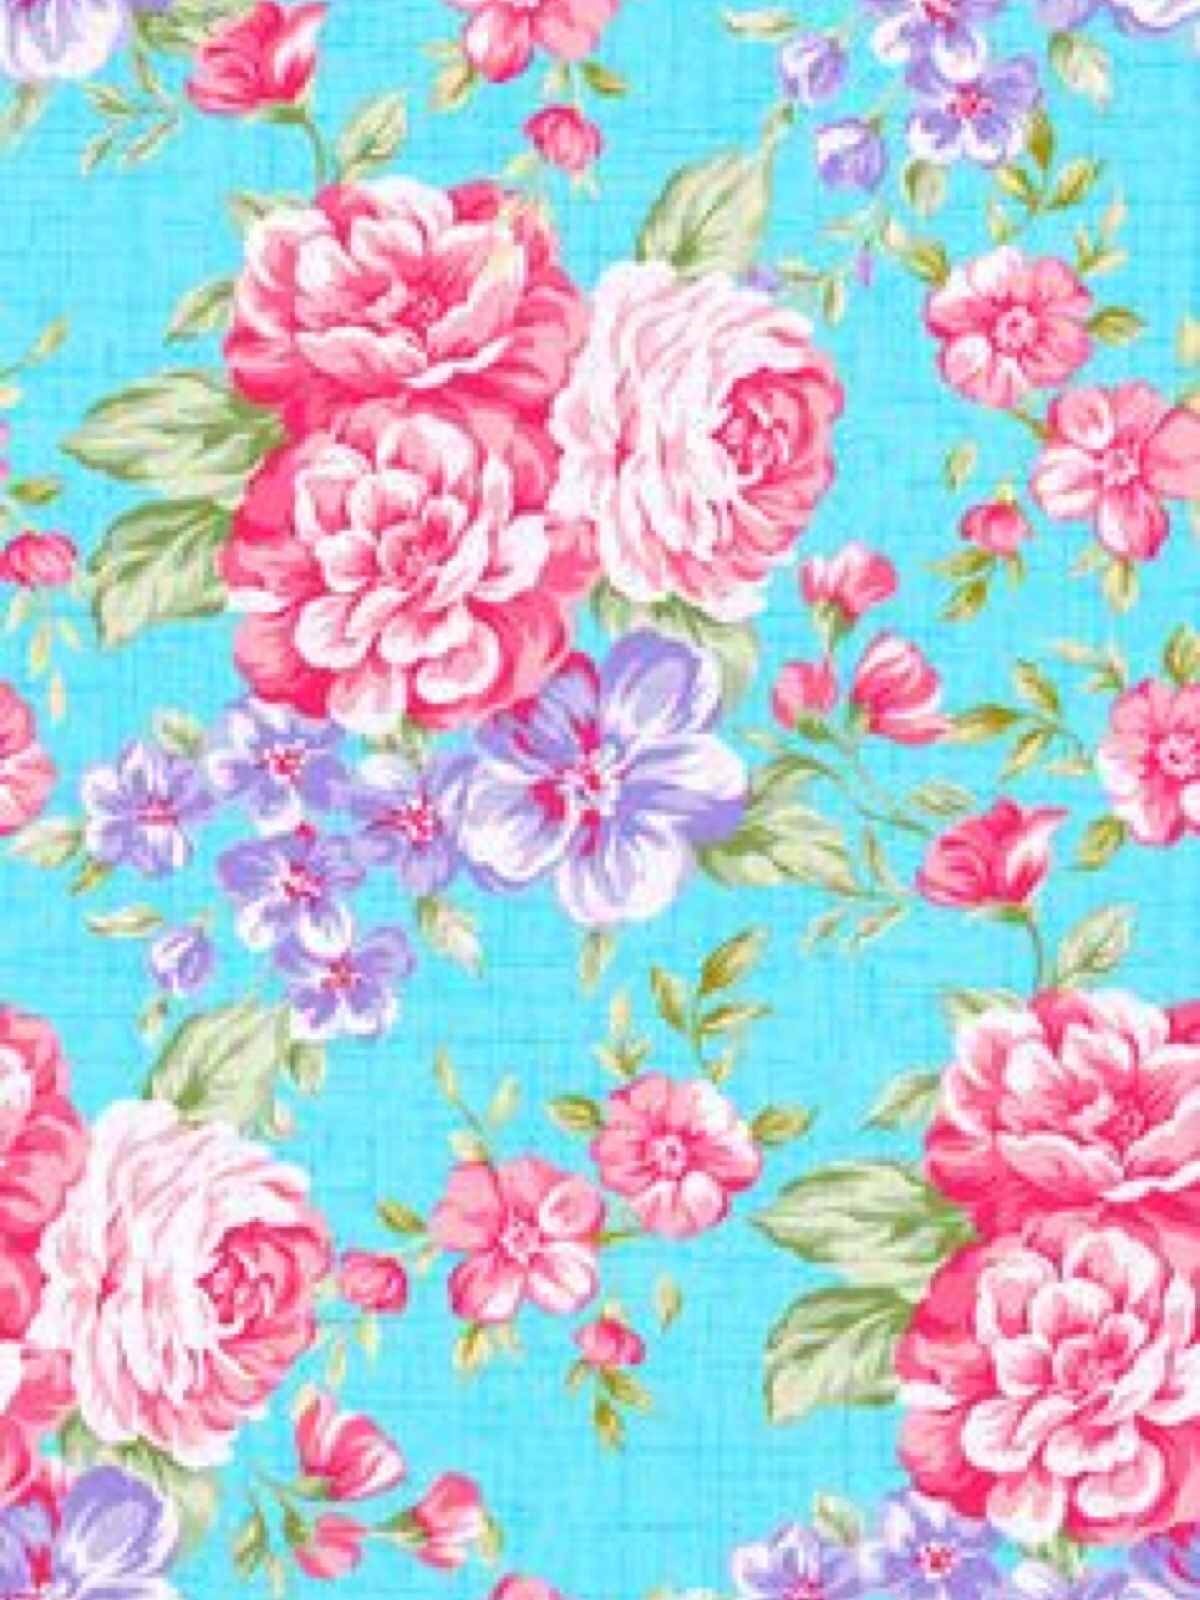 Wallpaper pink and blue flowers wallpapersafari blue and pink flower wallpaper romantic background pinterest 1200x1600 mightylinksfo